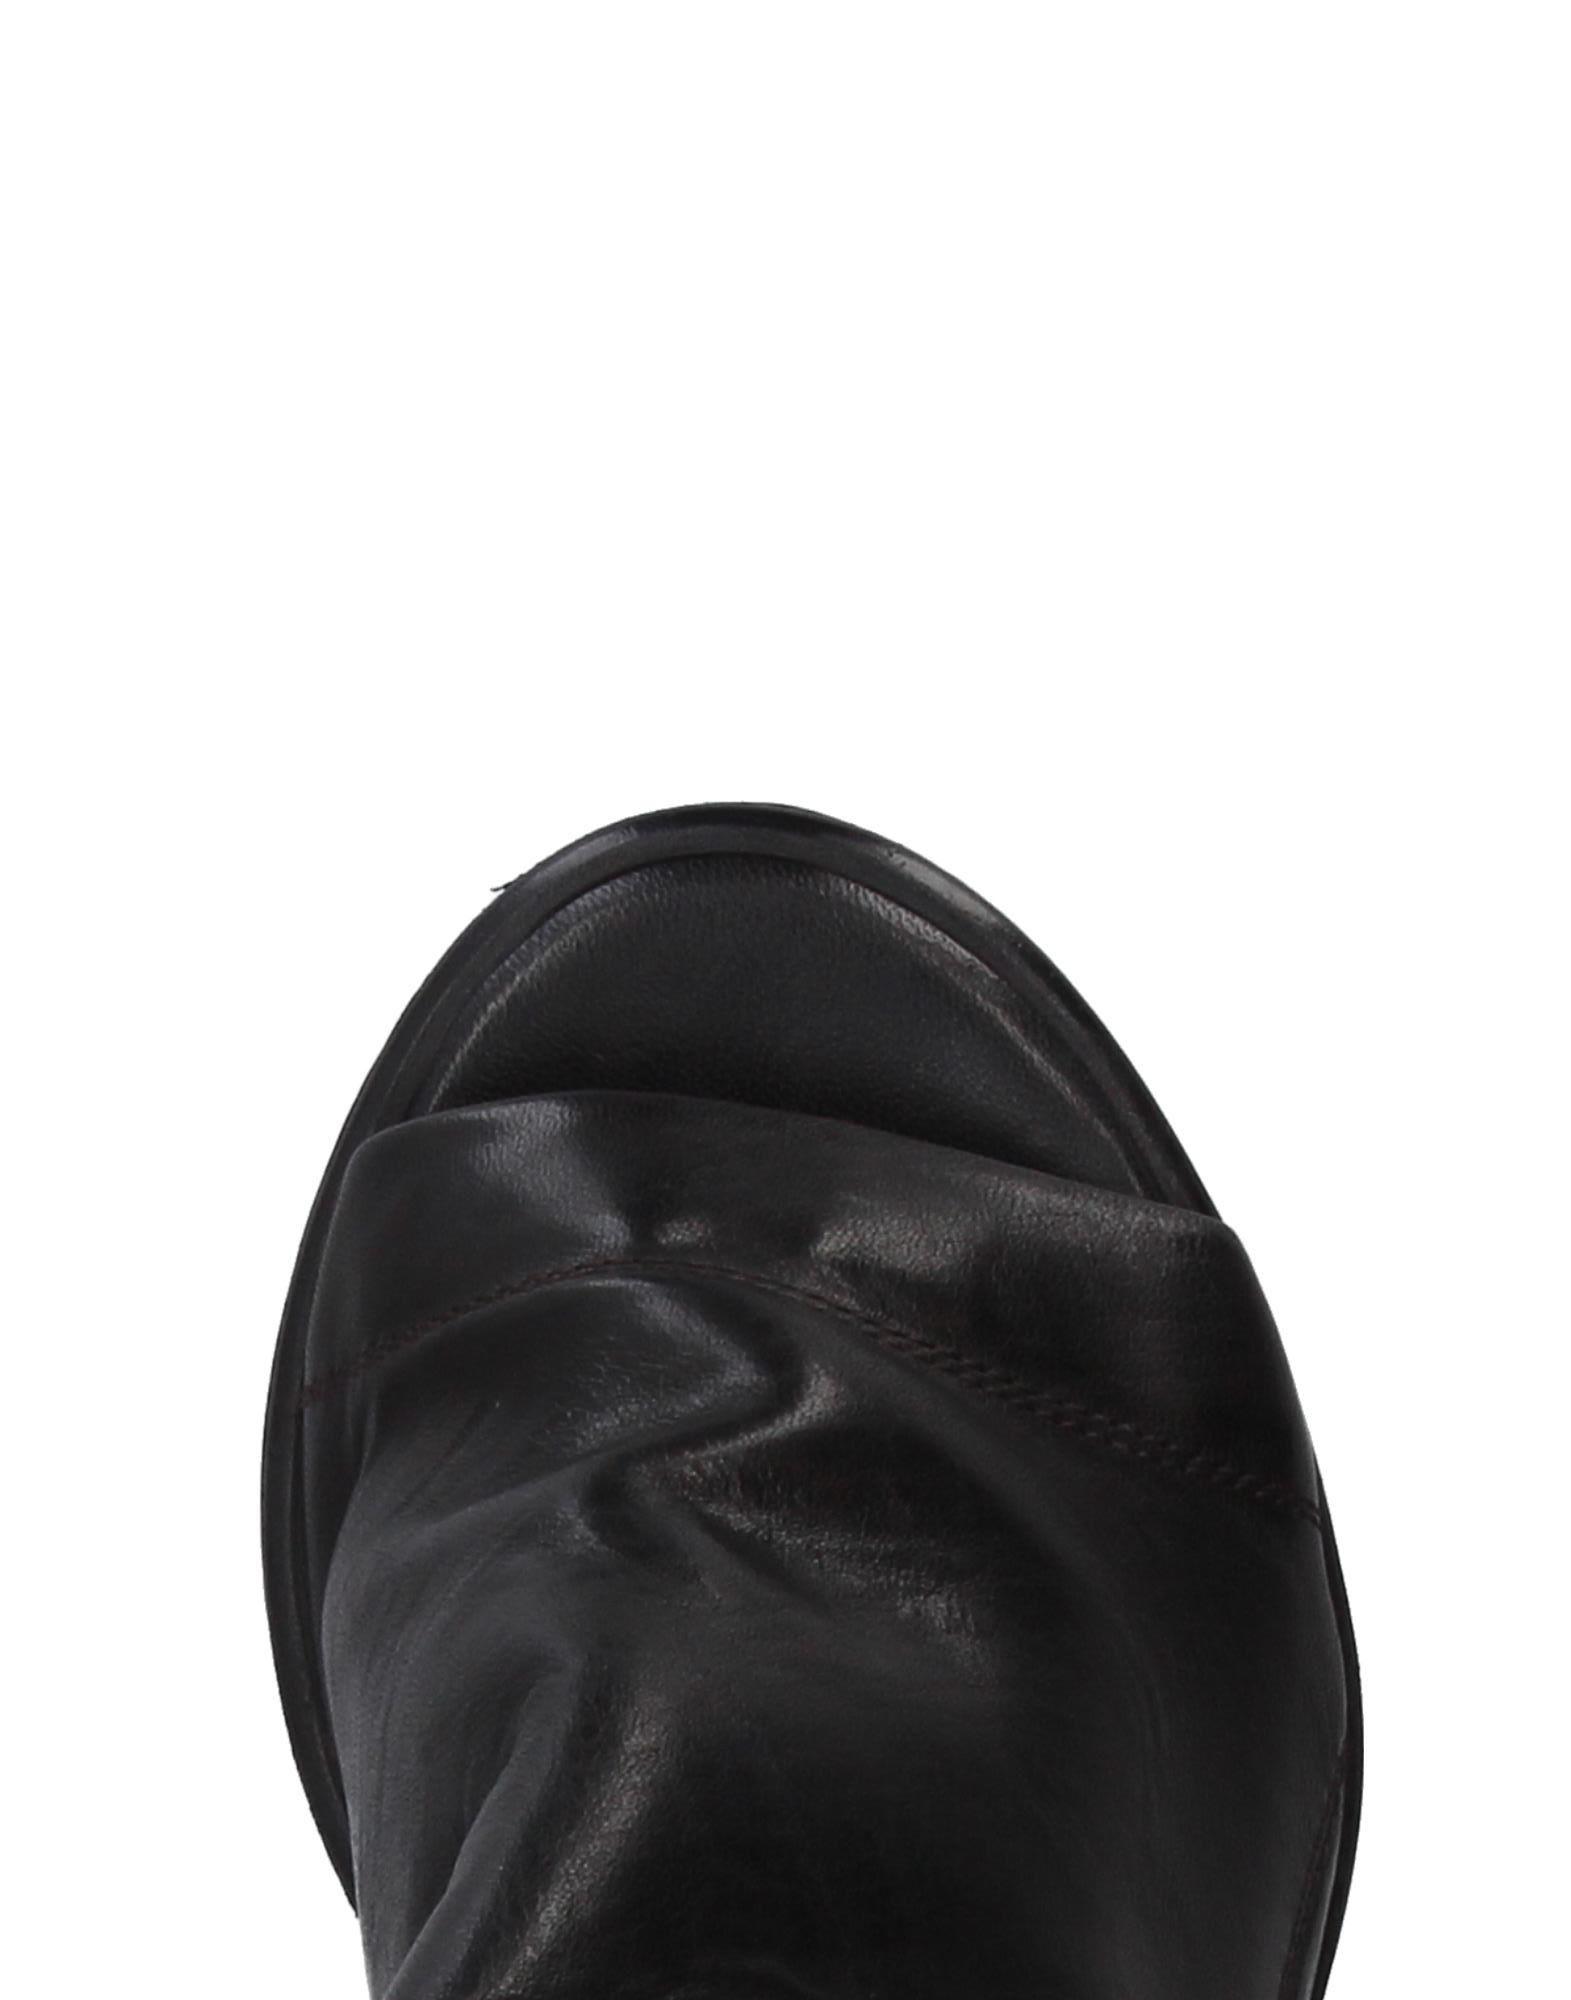 Stilvolle billige Schuhe Elena Iachi Sandalen Damen  11409620CQ 11409620CQ 11409620CQ d5c85c